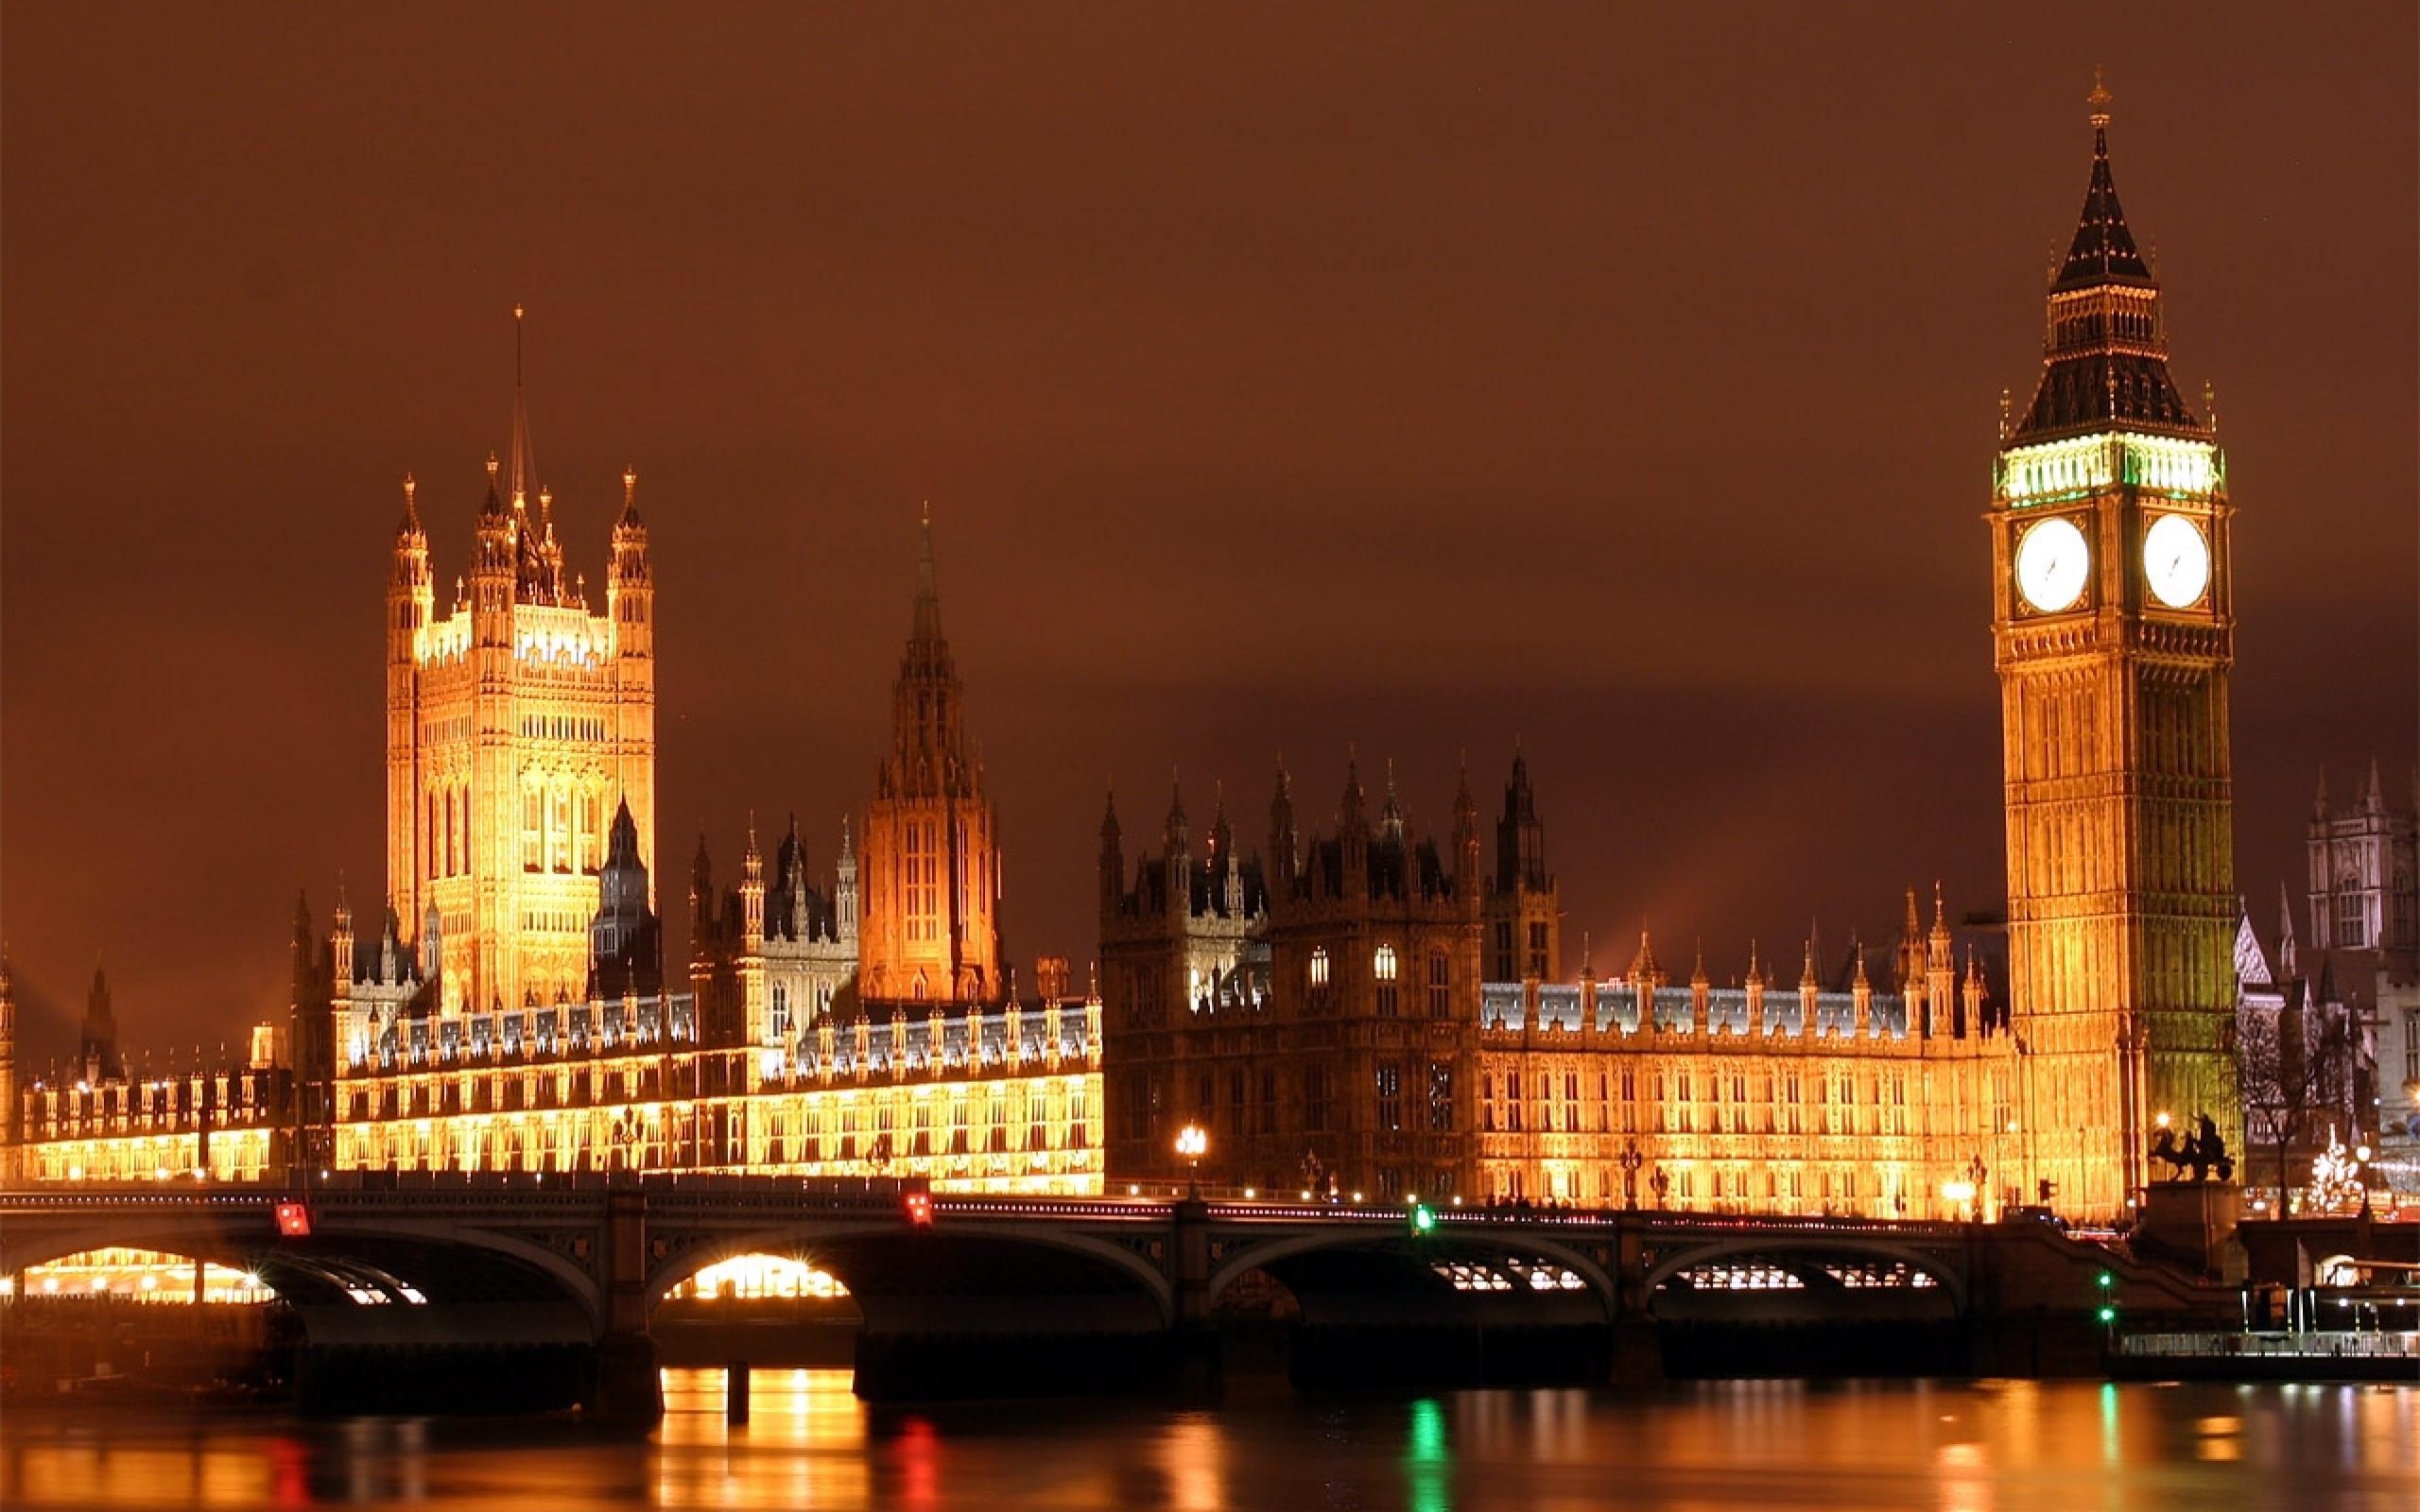 Big Ben At Night Wallpapers   2560x1600   888170 2560x1600